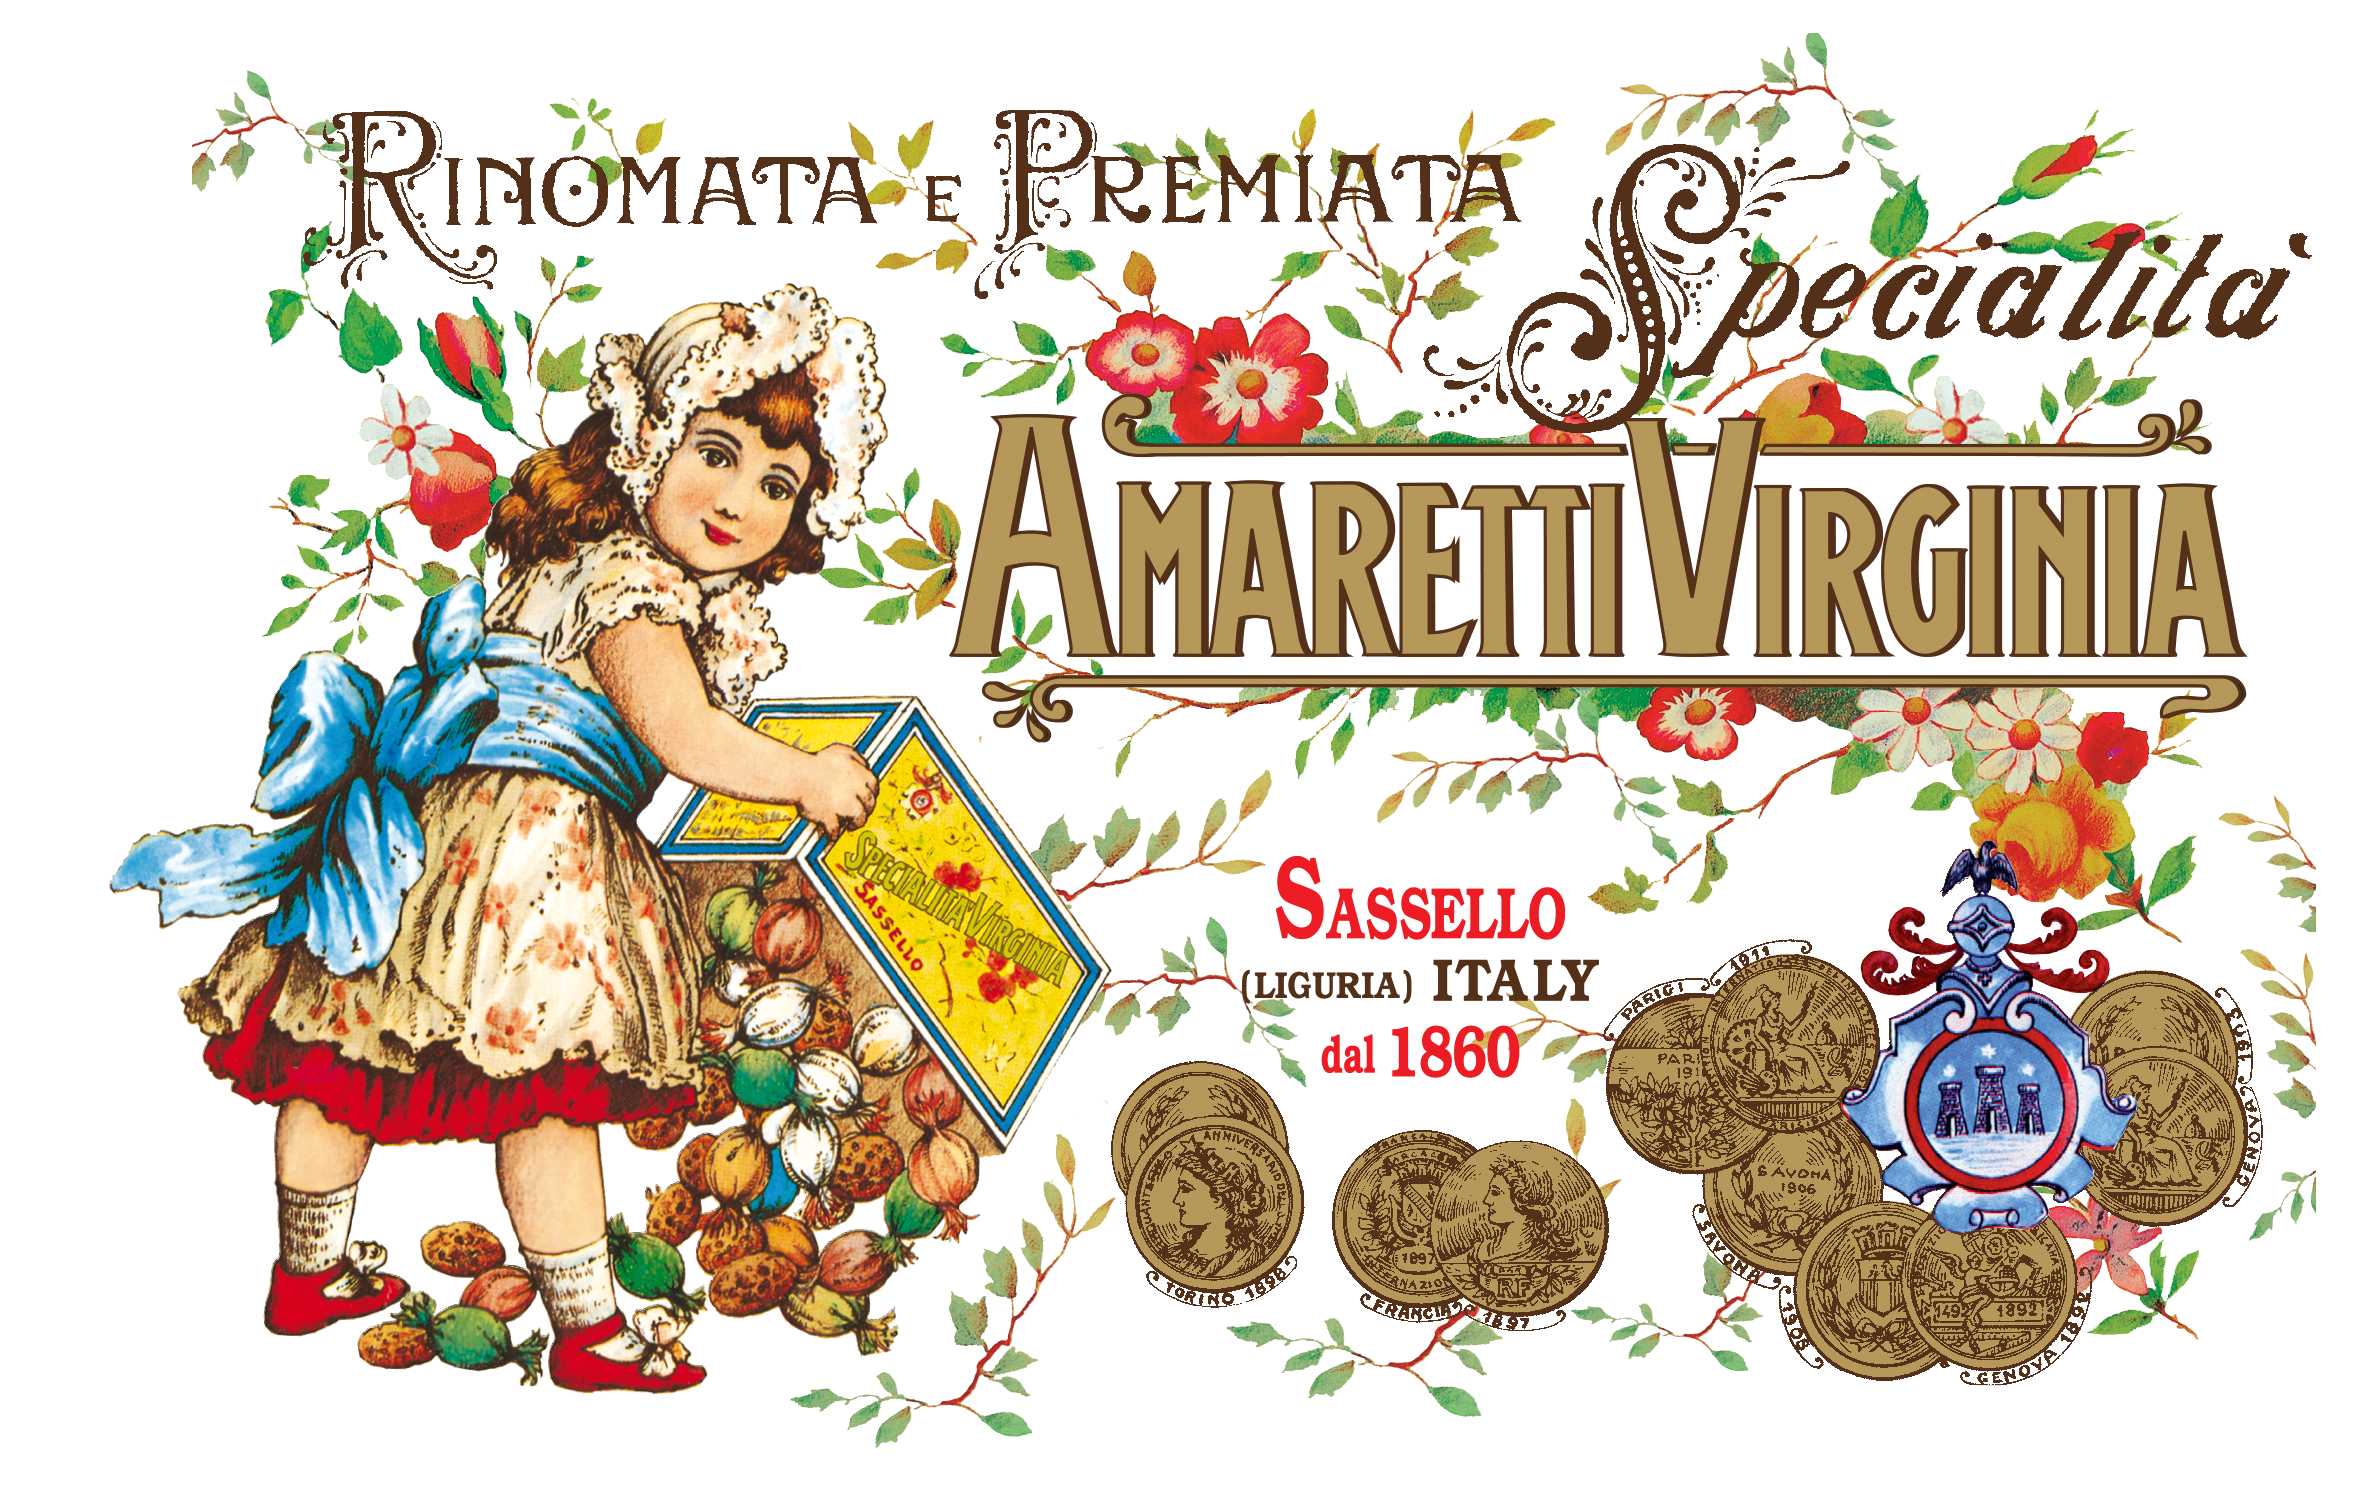 slider-image-https://amarettivirginia.testavendre.se/image/1962/Amaretti-Virginia-web.png